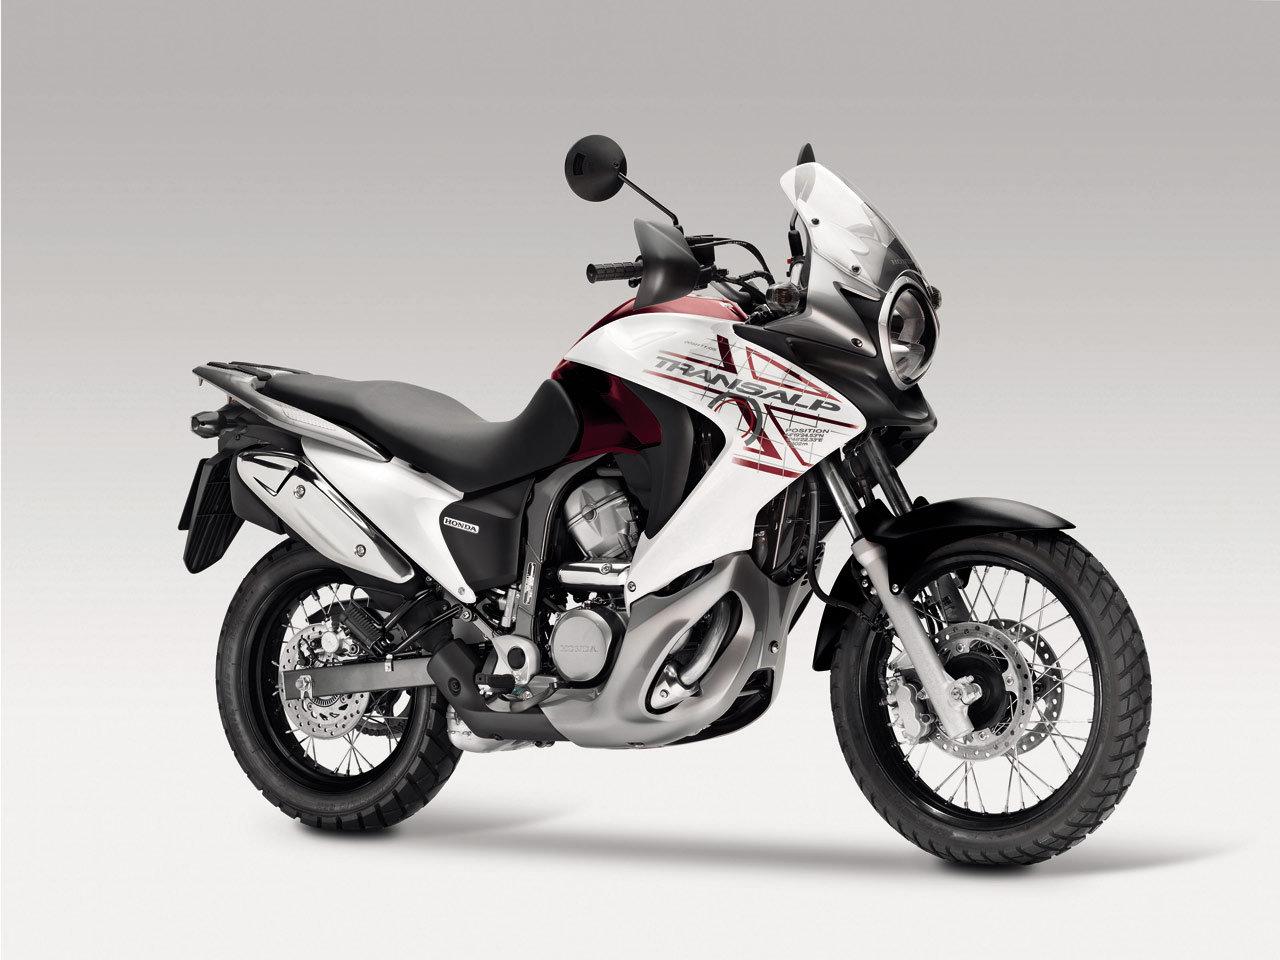 Listino Honda CB 500F Naked Media - image 14731_honda-transalpabs on http://moto.motori.net